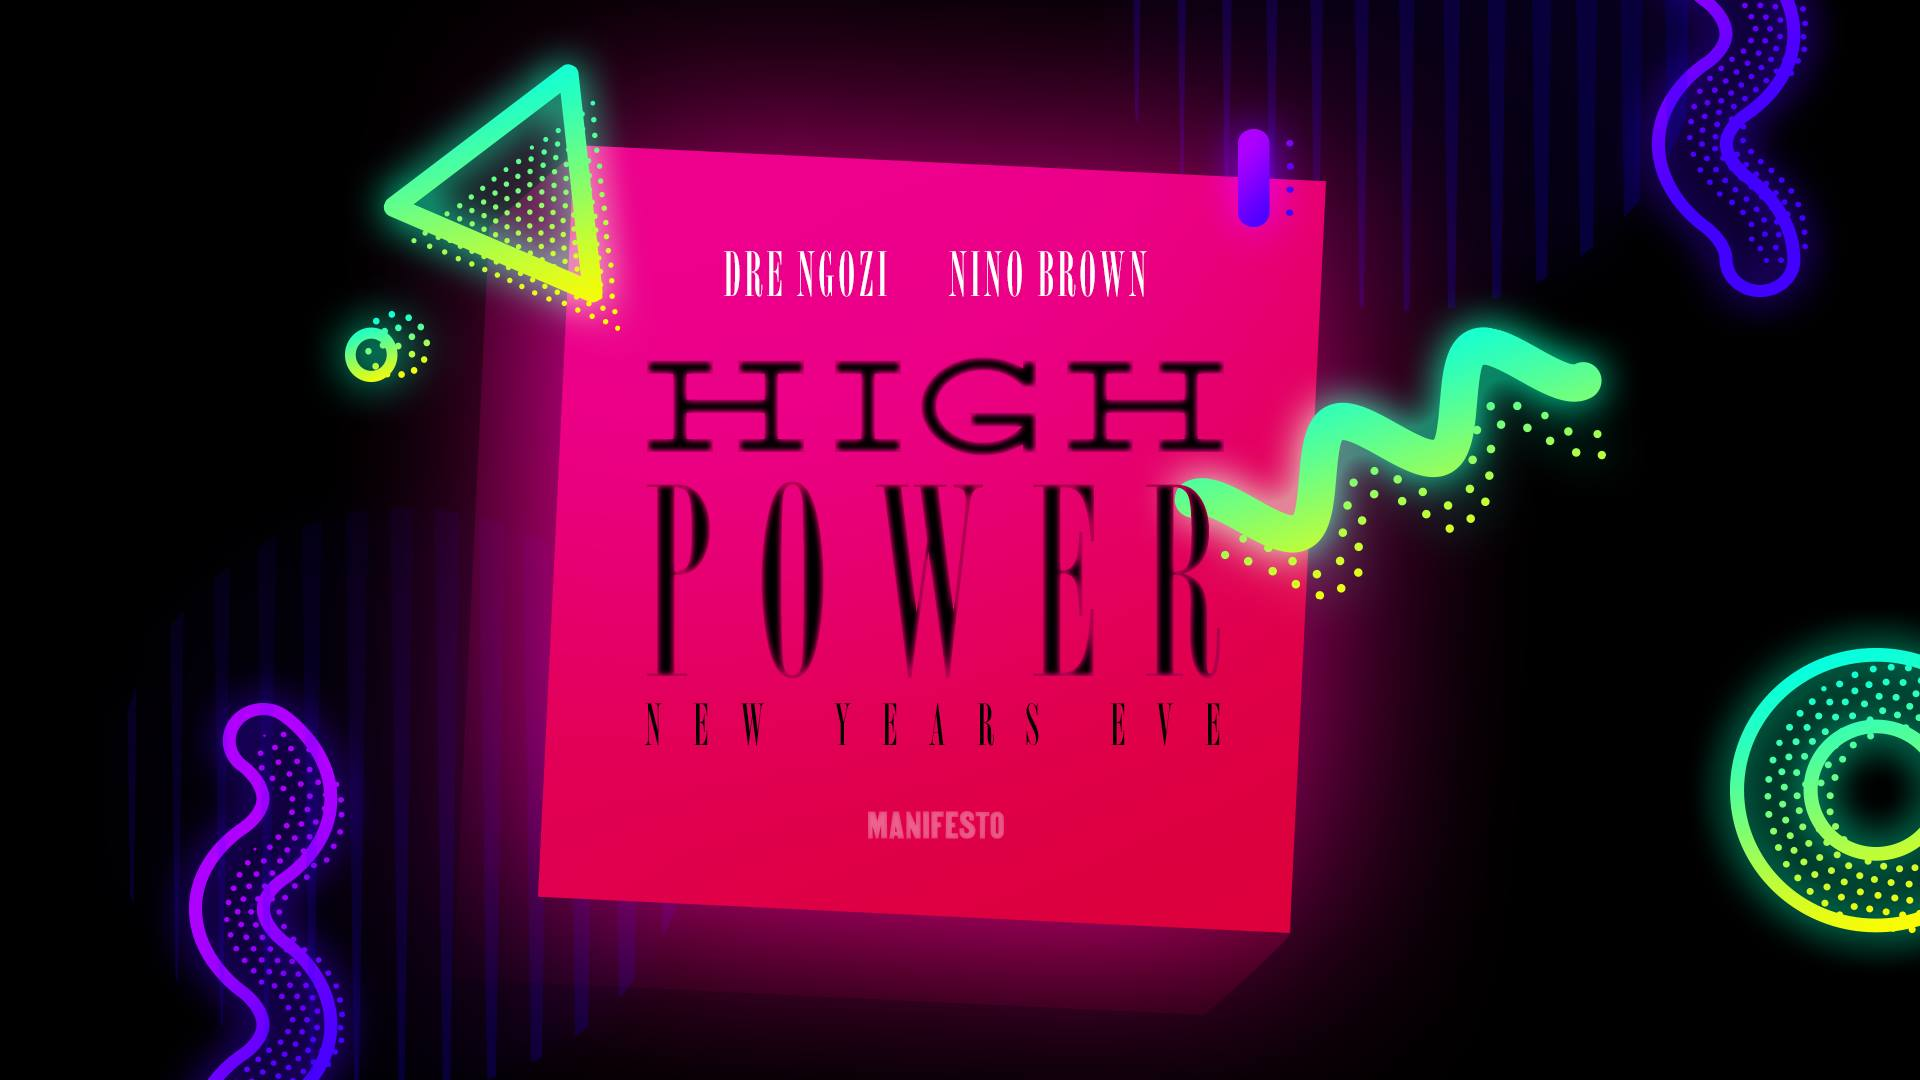 high-power-toronto